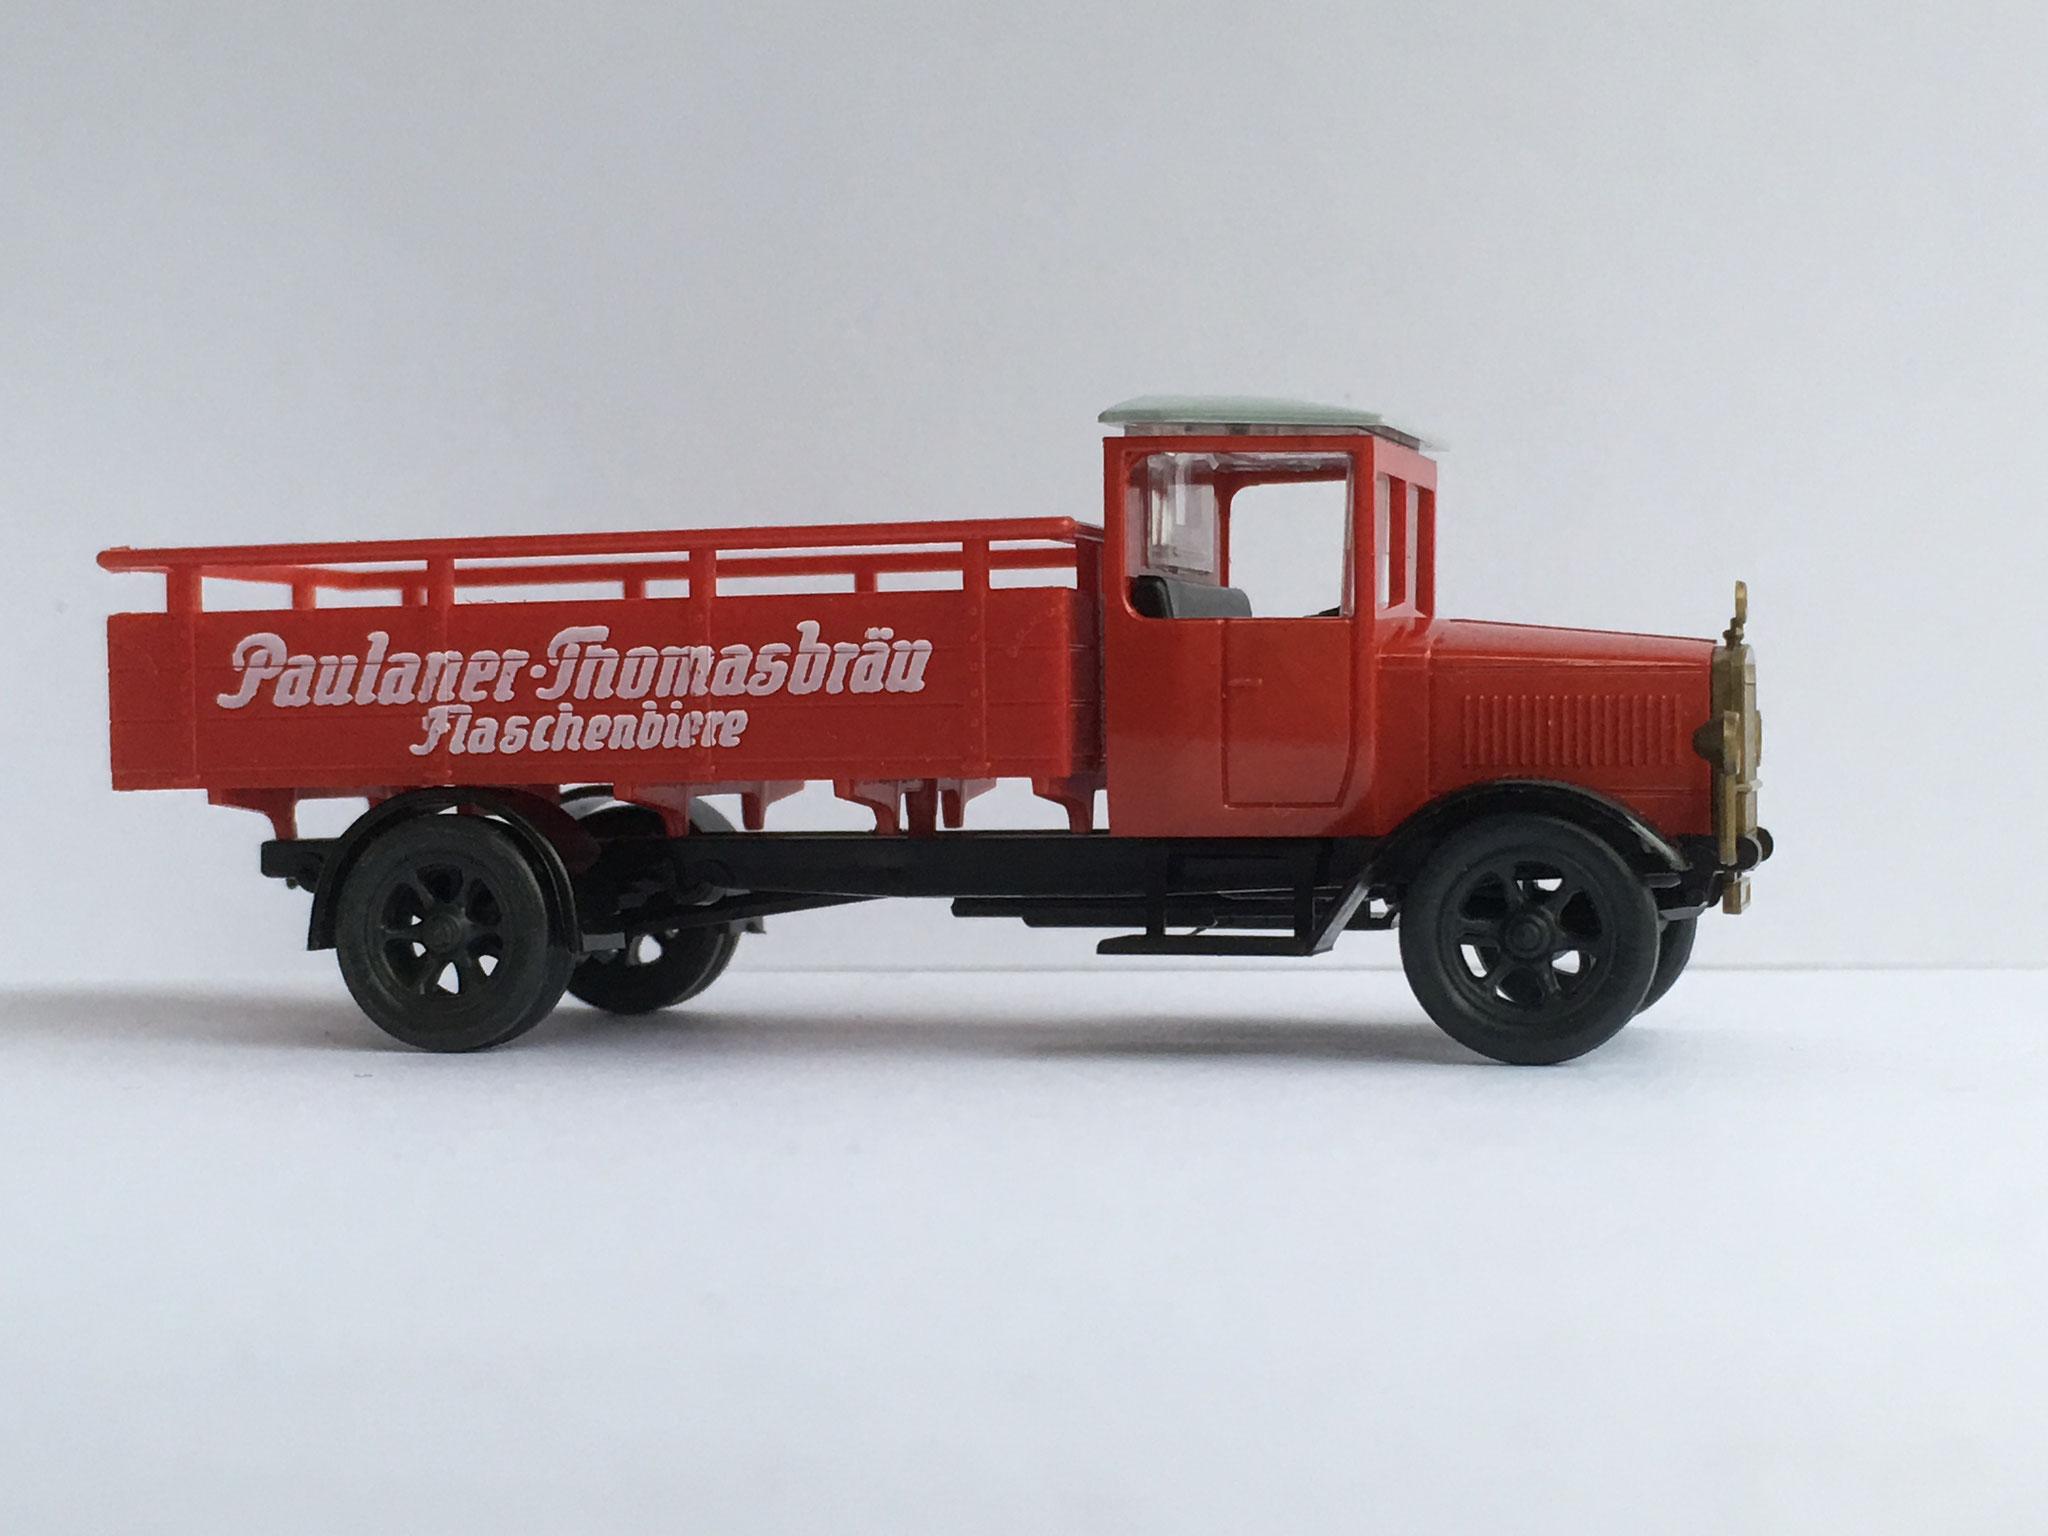 Mercedes L5 Brauereiwagen Paulaner Thomasbräu, Art. Nr. 333 (ab 1992 im Programm)